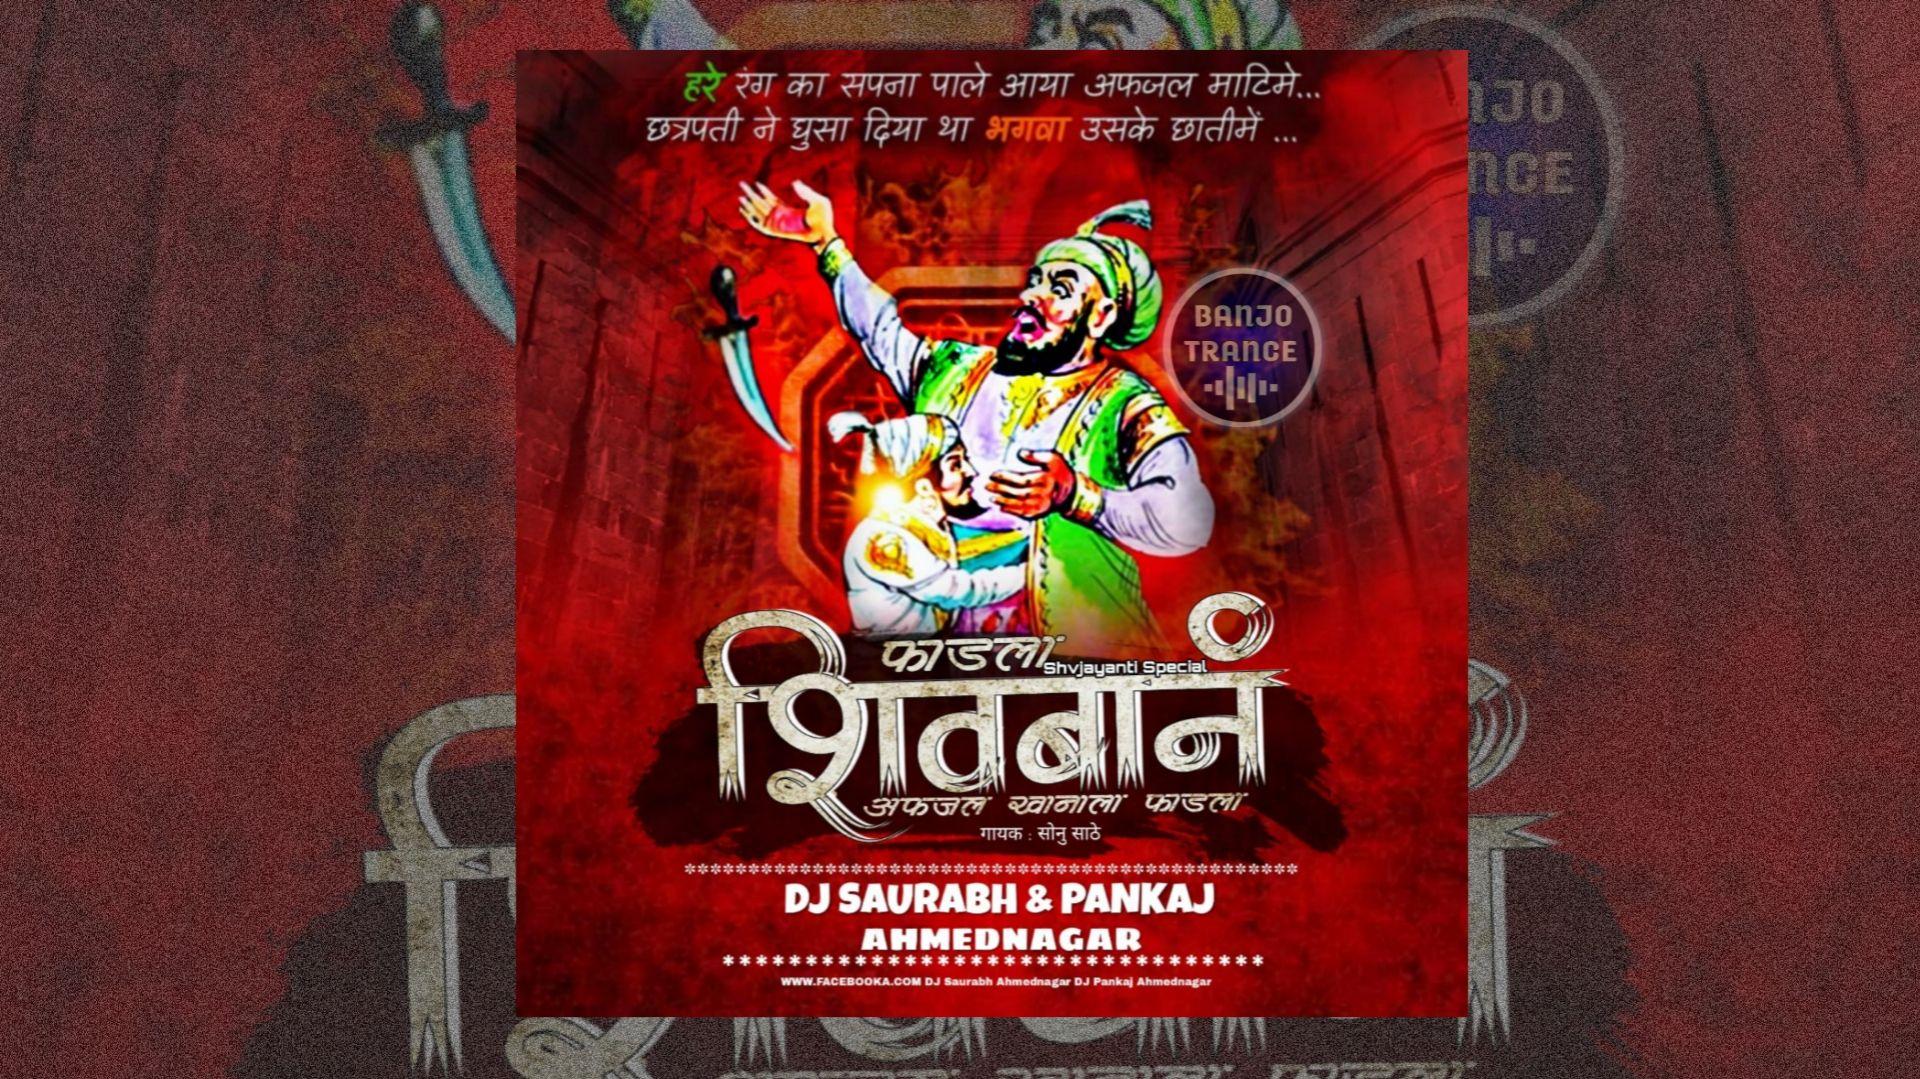 Shivjayanti Special Song Fadla Shivban Afzal Khanala Dj Saurabh Songs Social Sites Dj